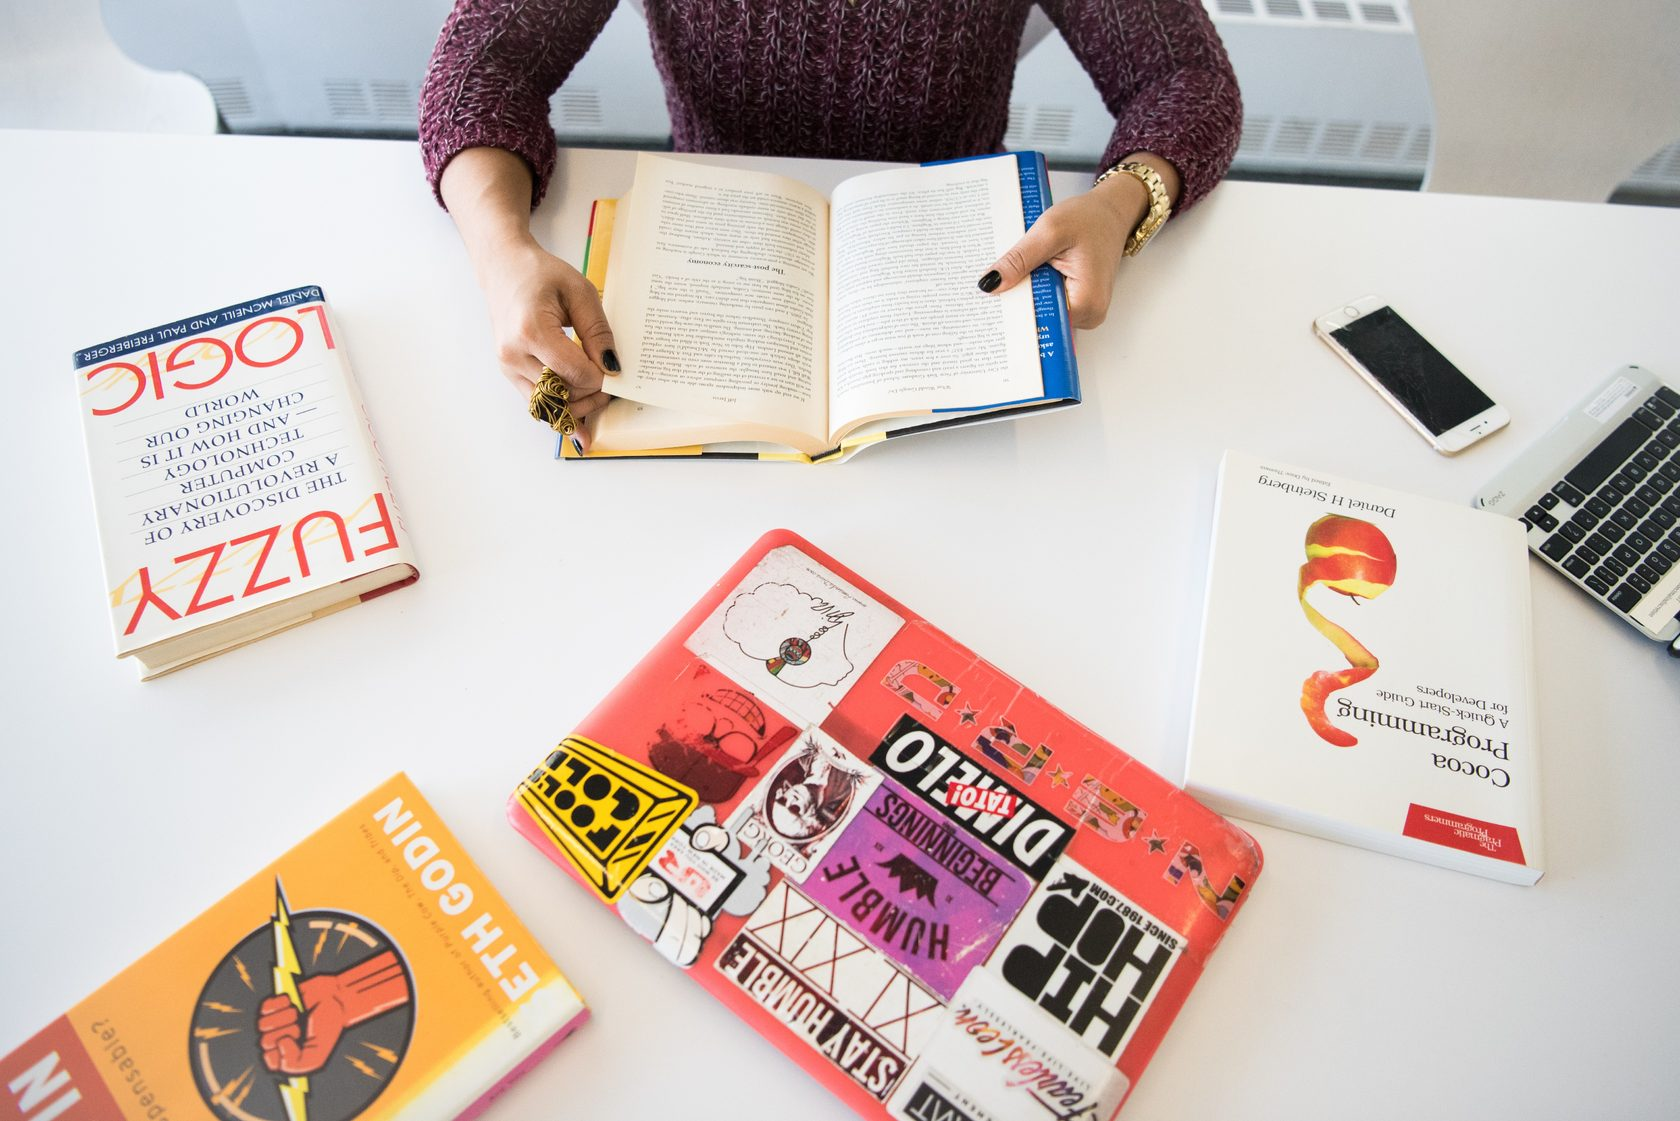 Litpromoters Free Books Advantages And Disadvantages